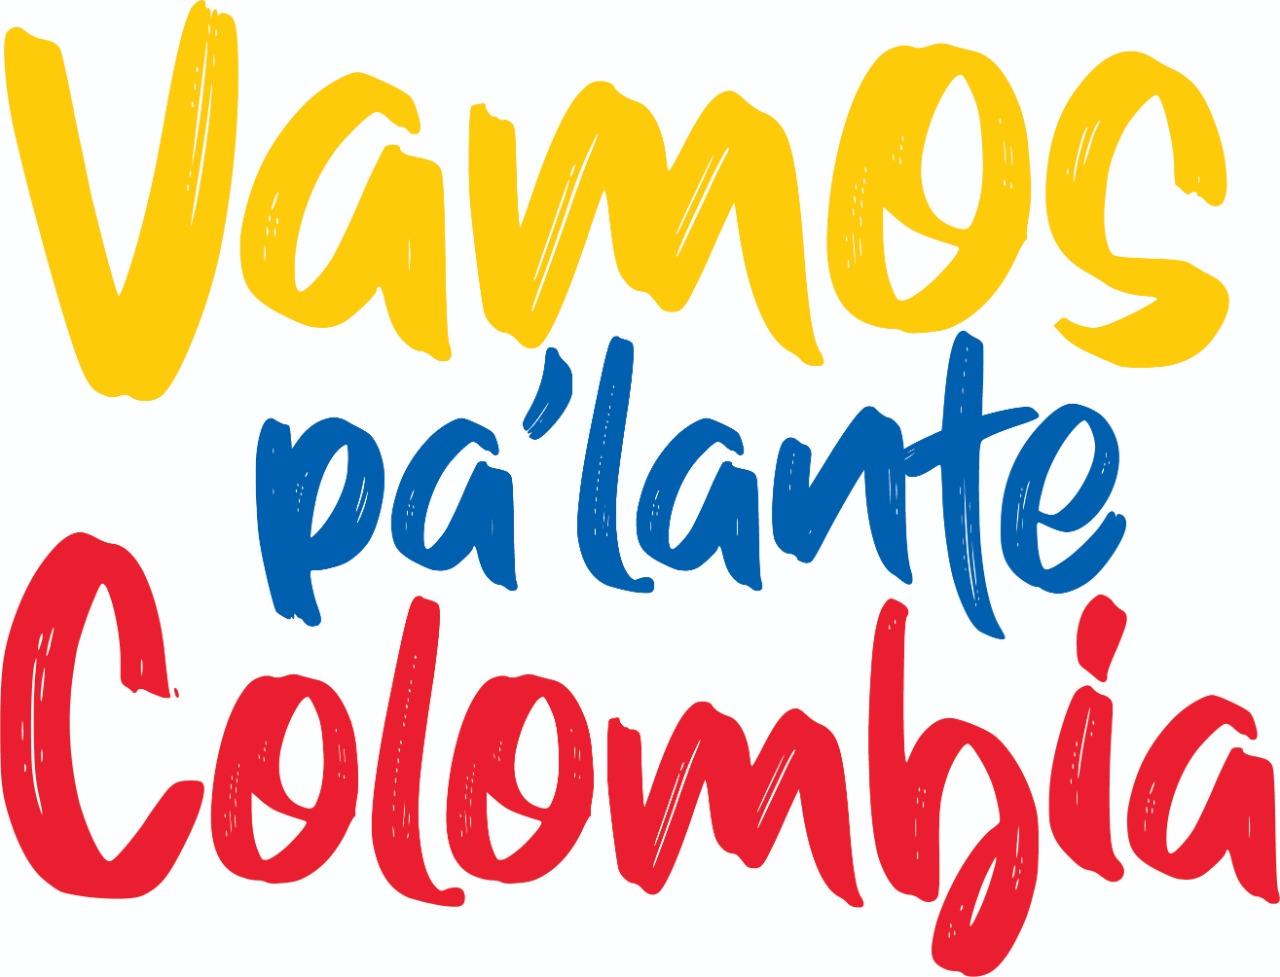 Festival Independencia Orgullo Colombiano en Washington